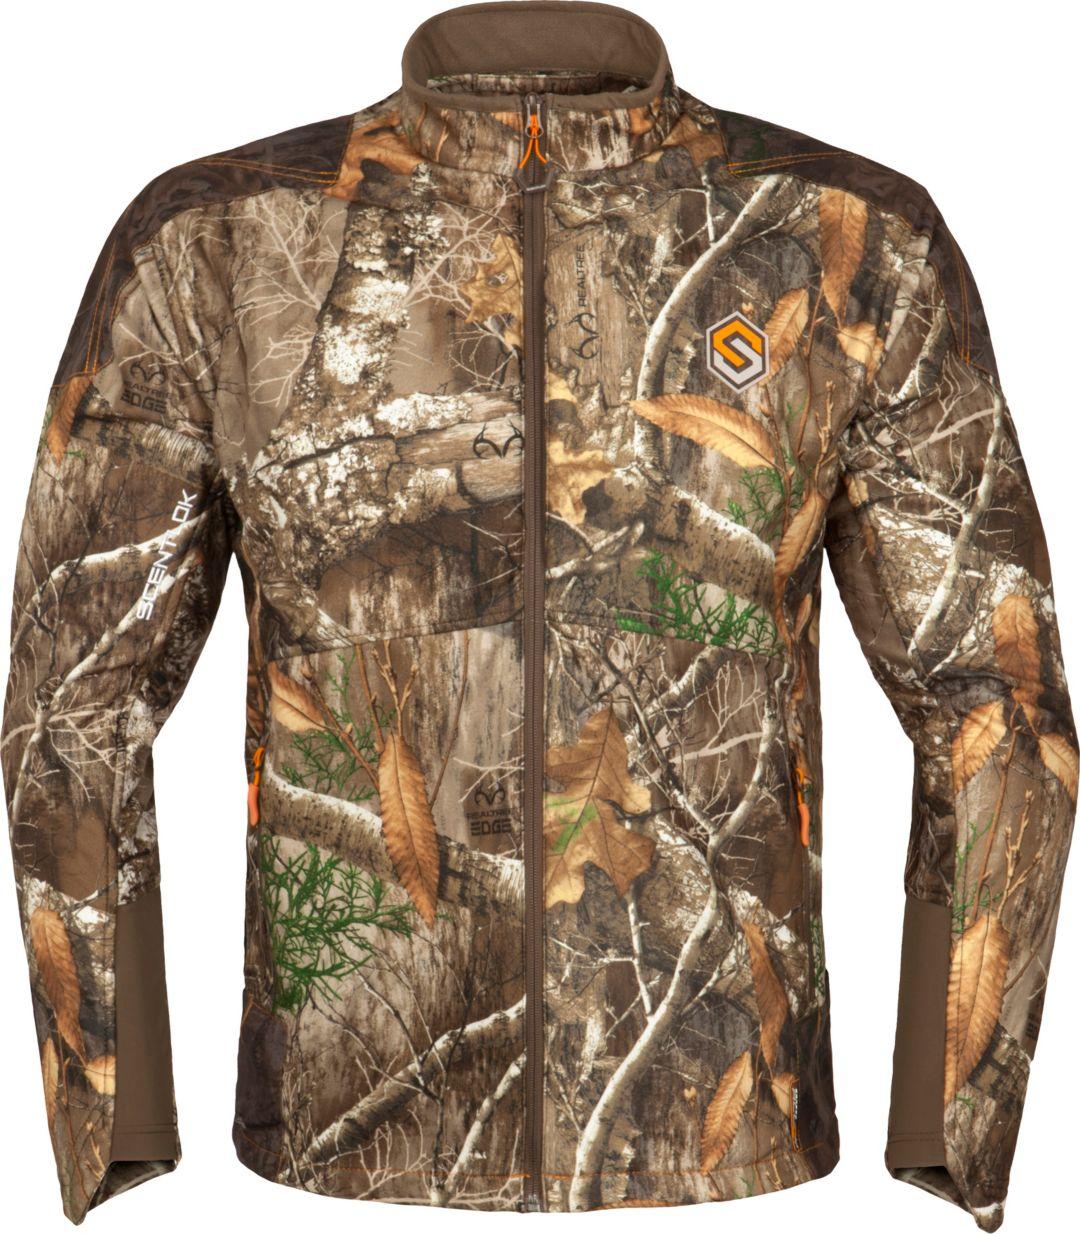 0ea33aeb689a6 ScentLok Men's Full Season Taktix Hunting Jacket | Field & Stream